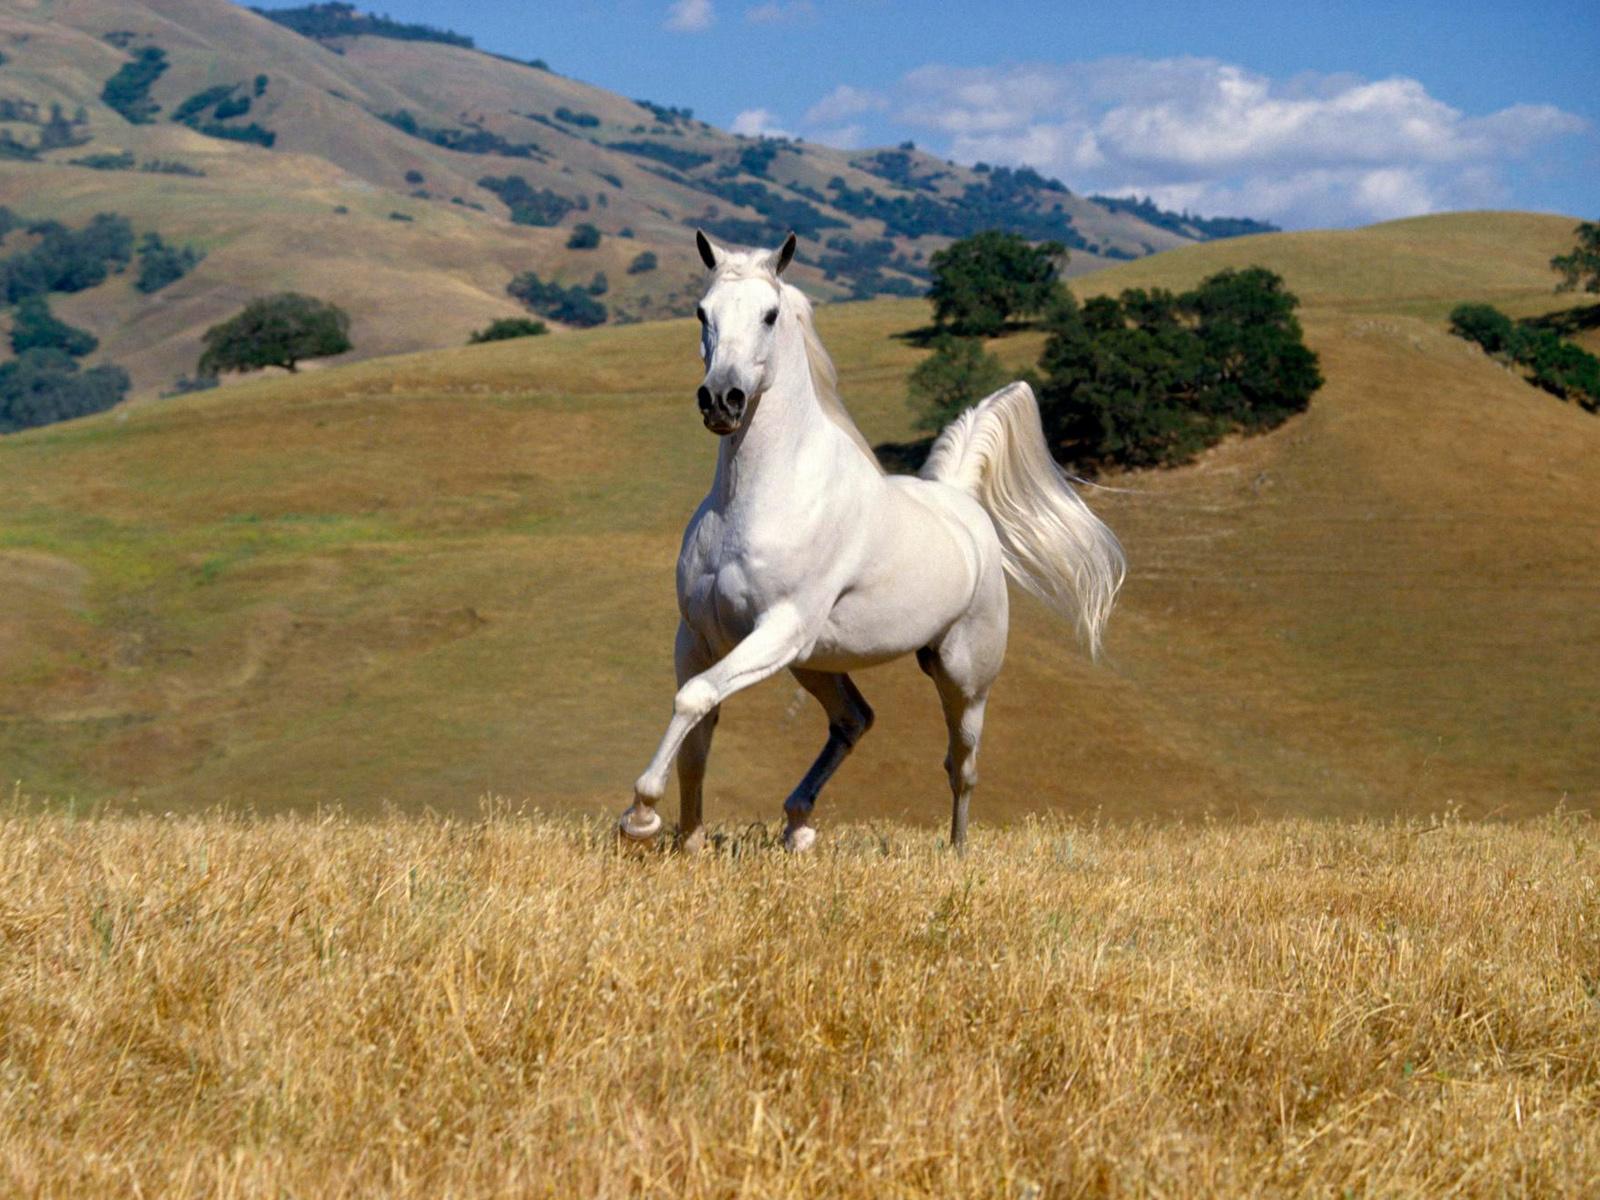 pictures top 10 horse wallpaper horse wallpaper 1600x1200